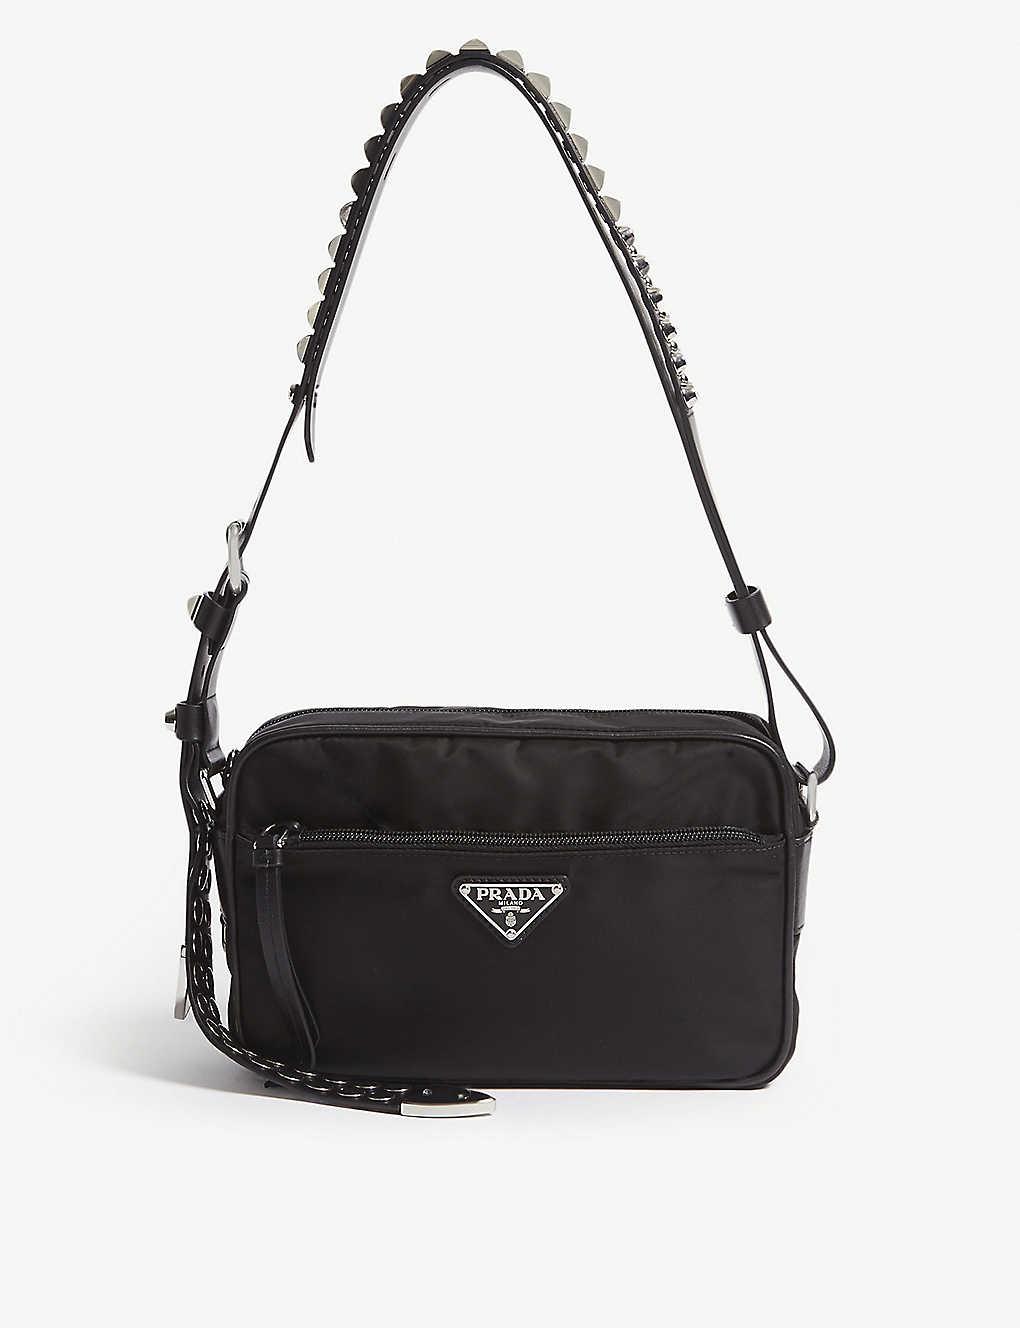 8a2d470311f5 PRADA - Studded strap nylon shoulder bag | Selfridges.com